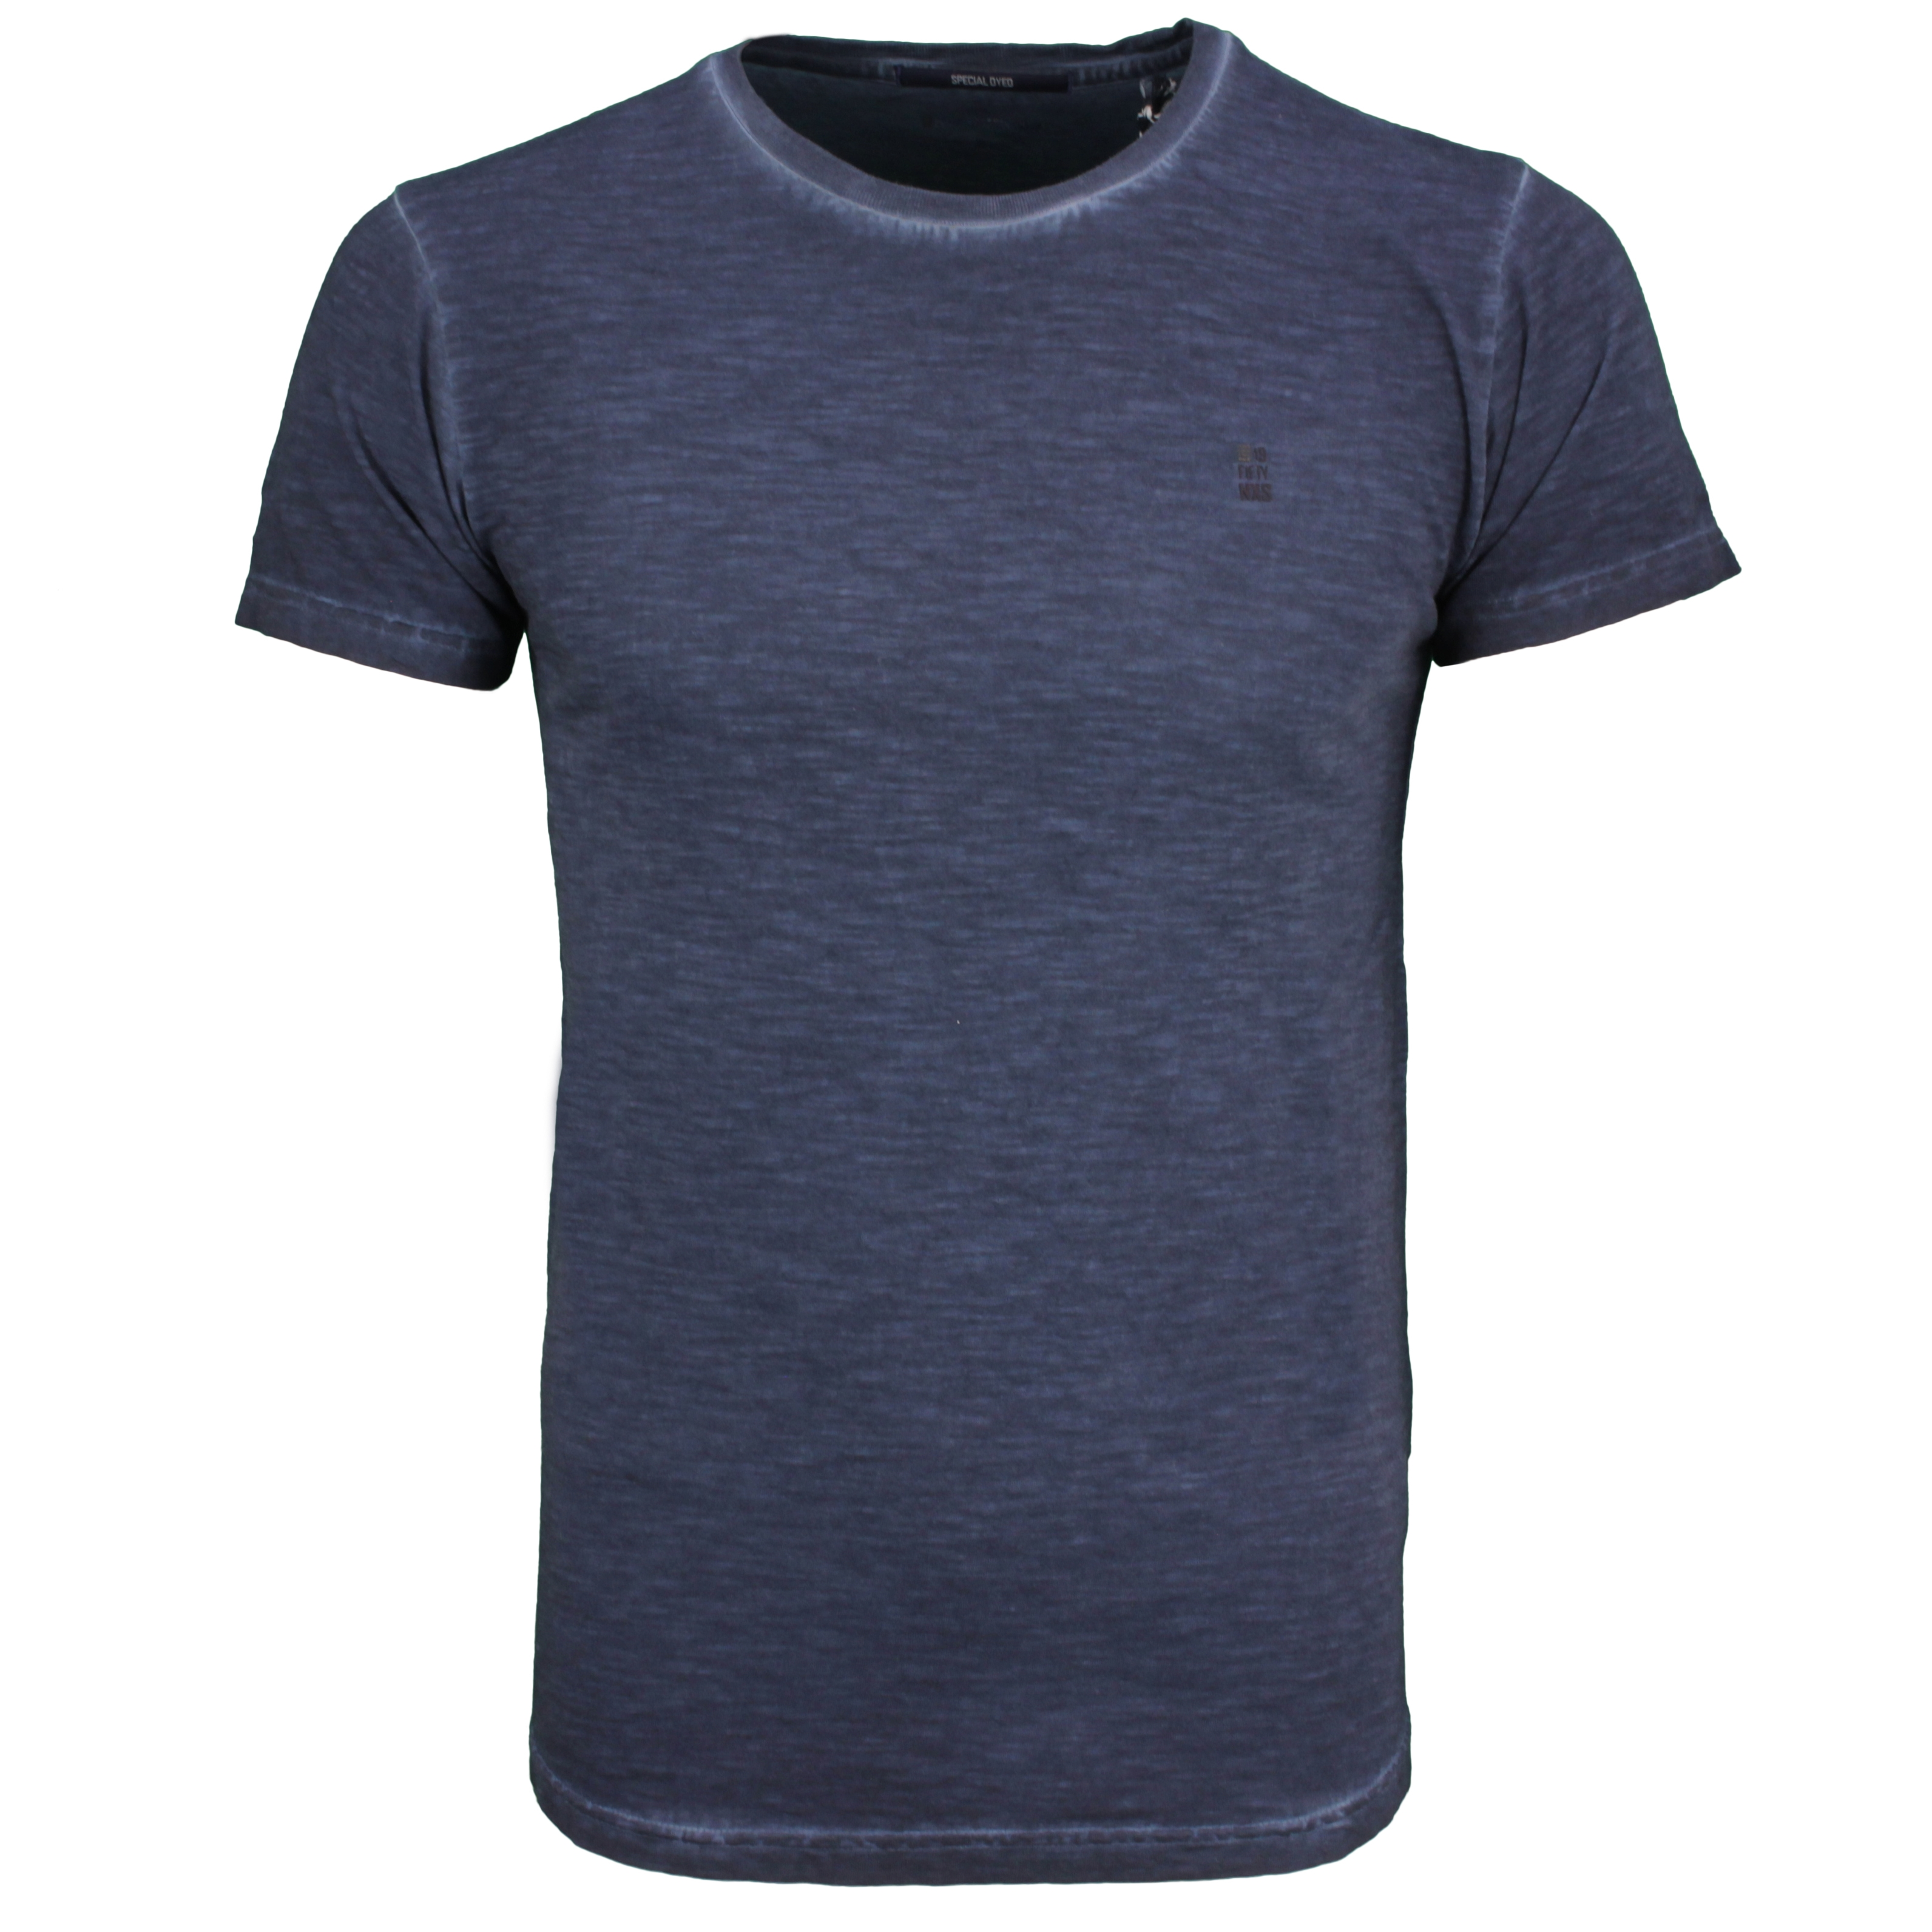 No Excess Herren T-Shirt Shirt kurzarm blau unifarben 96350419 078